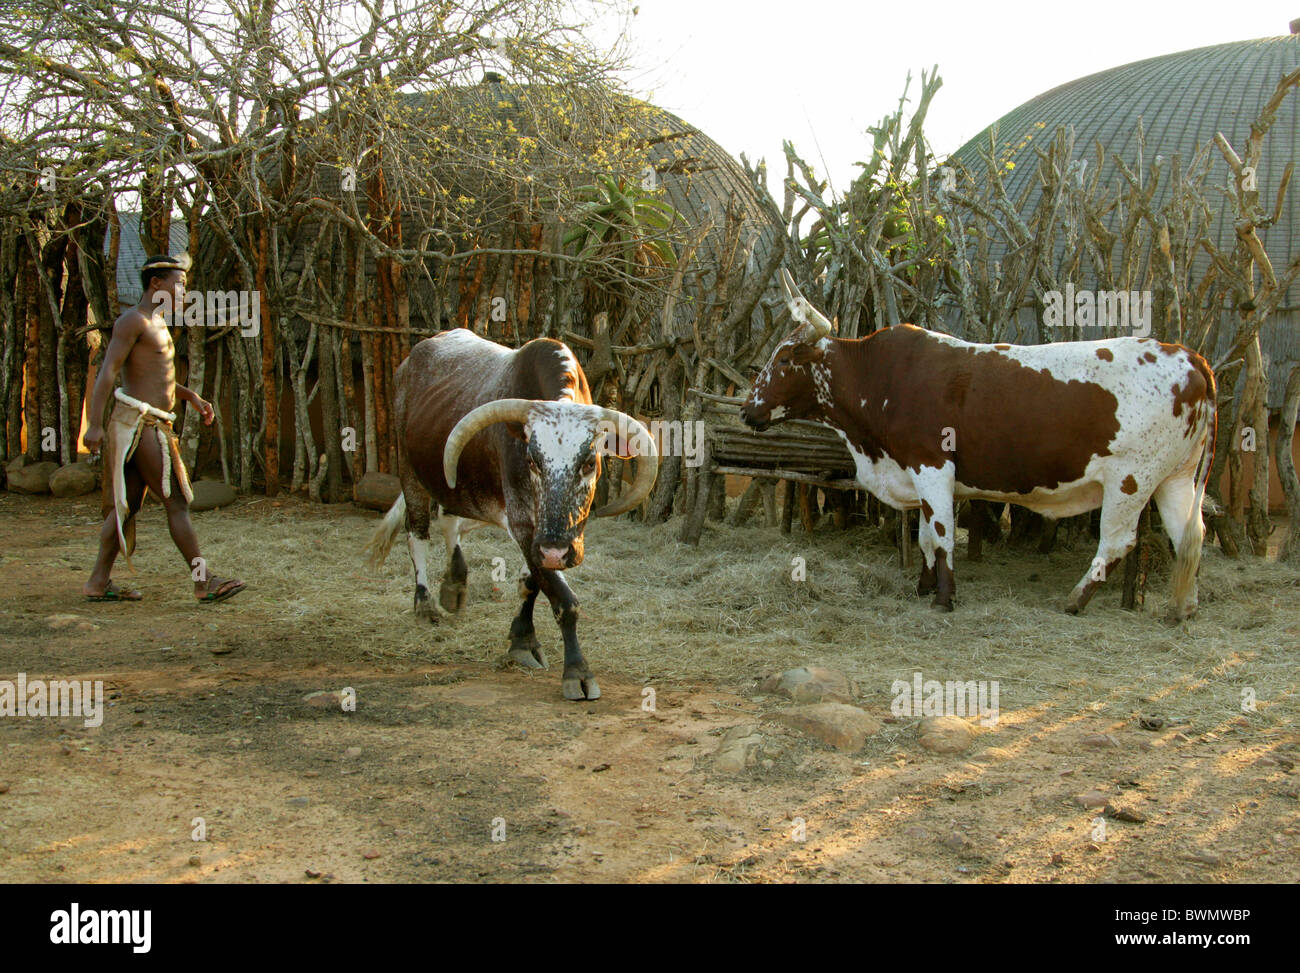 c5232c95c Zulu Man and Nguni Cattle, Shakaland Zulu Village, Nkwalini Valley, Kwazulu  Natal,